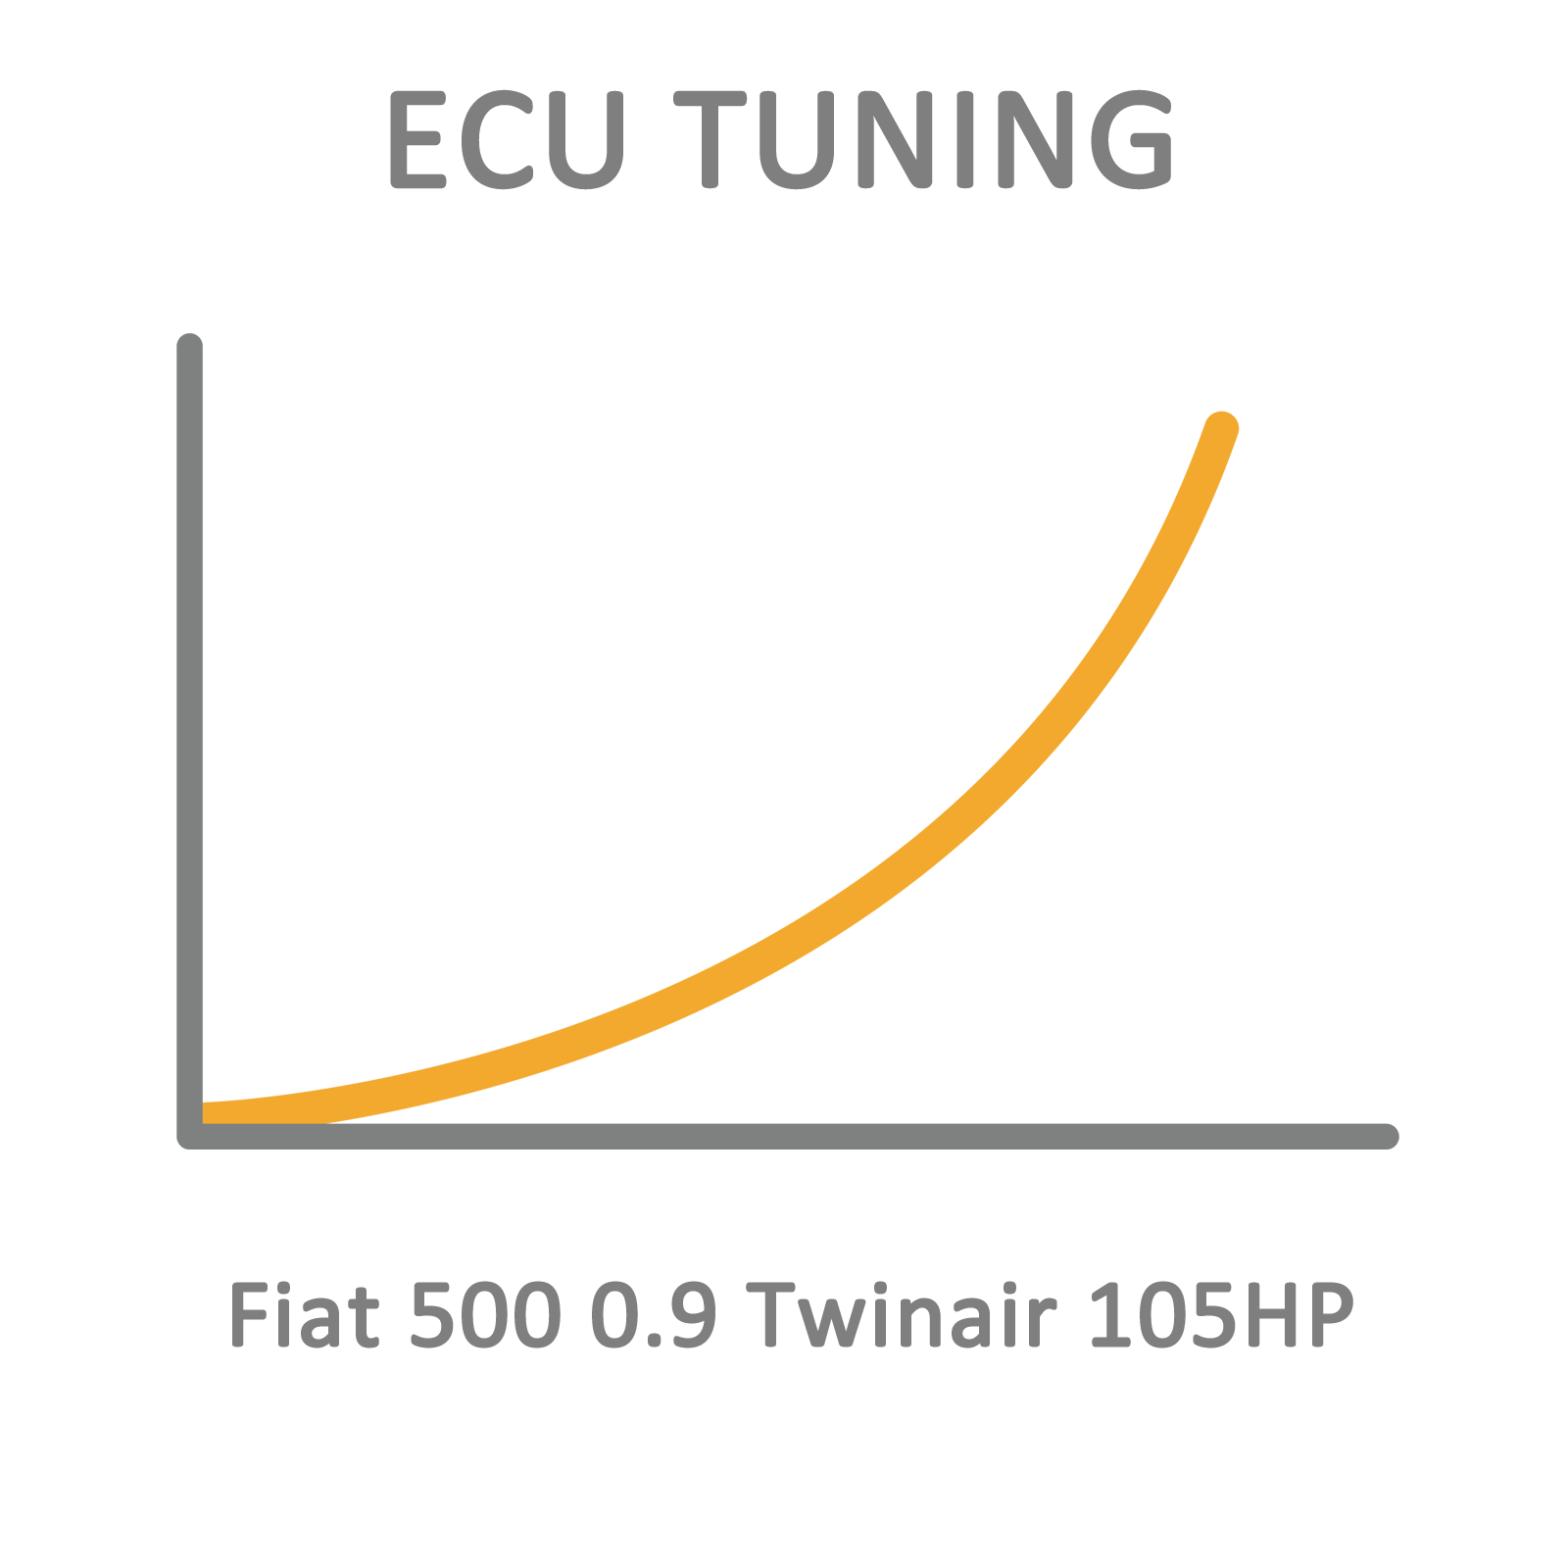 Fiat 500 0.9 Twinair 105HP ECU Tuning Remapping Programming